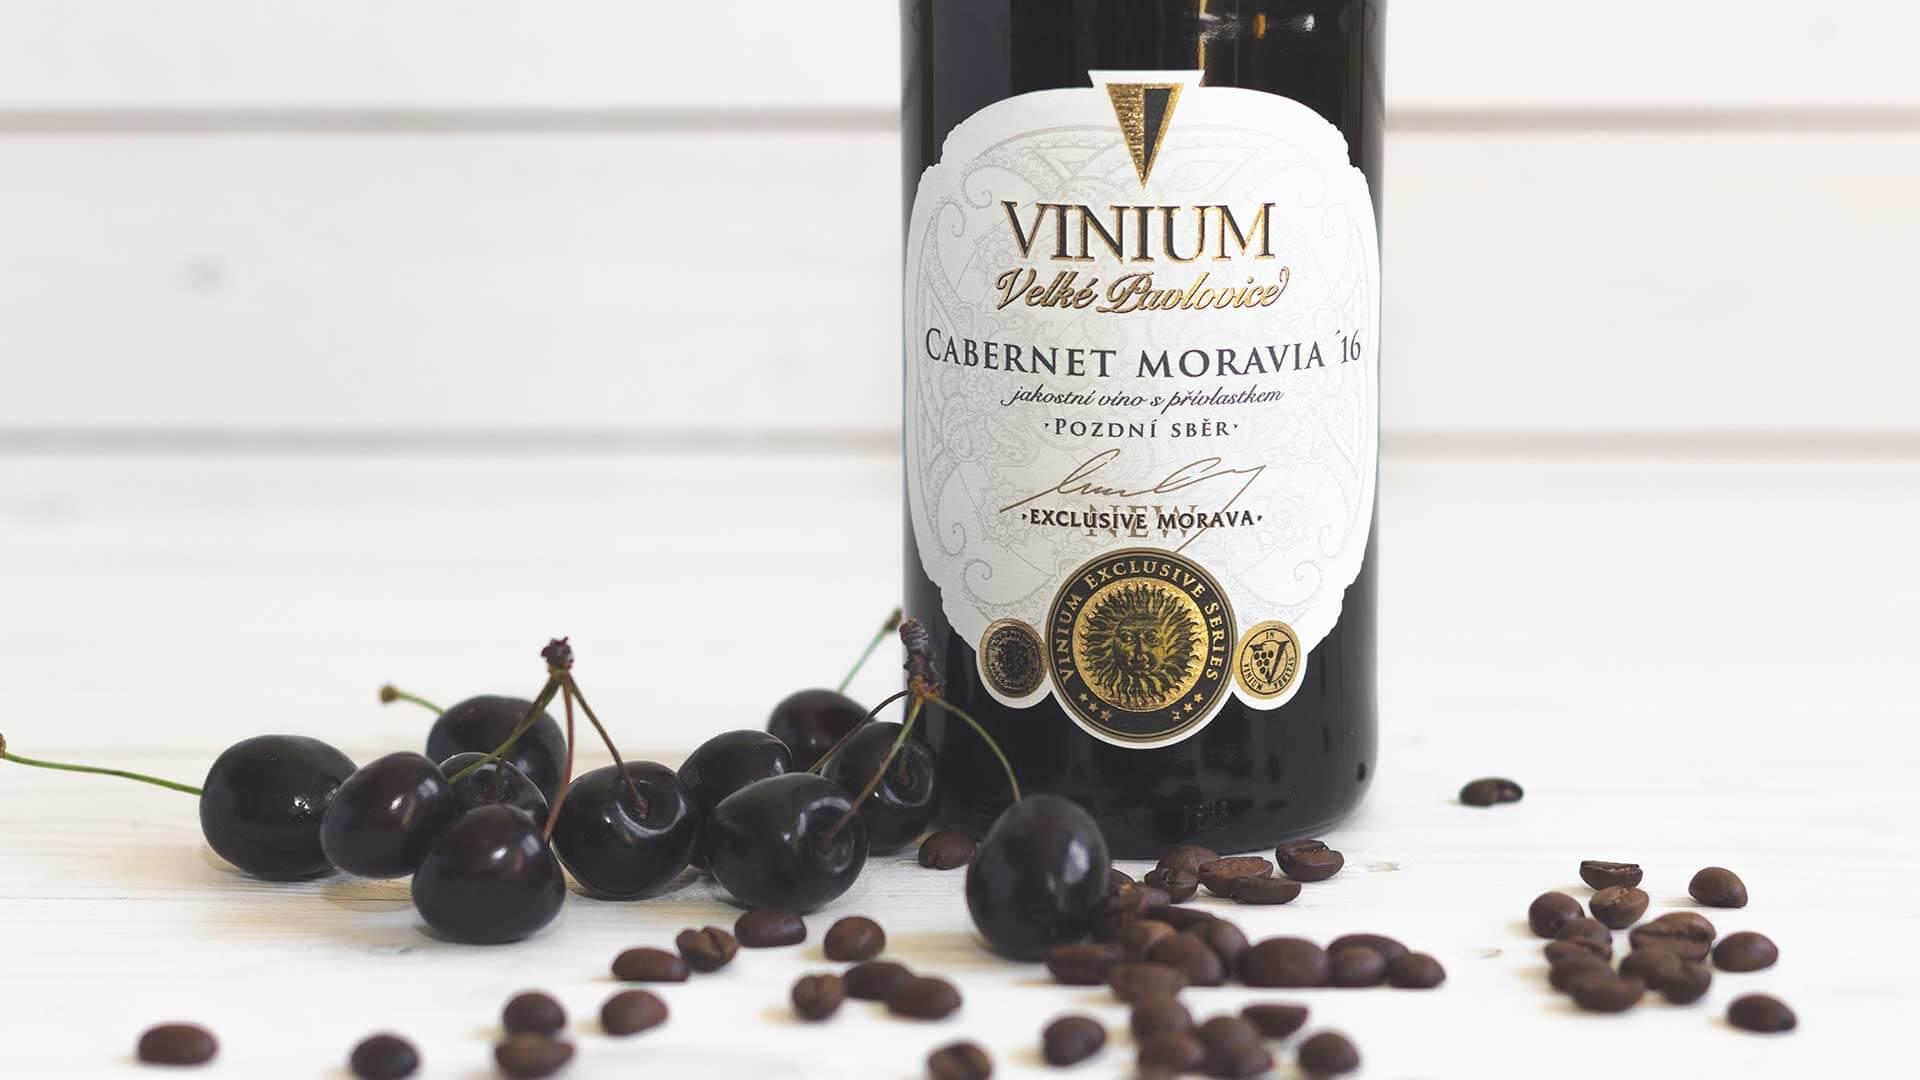 Cabernet Moravia 2016, pozdní sběr, VINIUM Exclusive